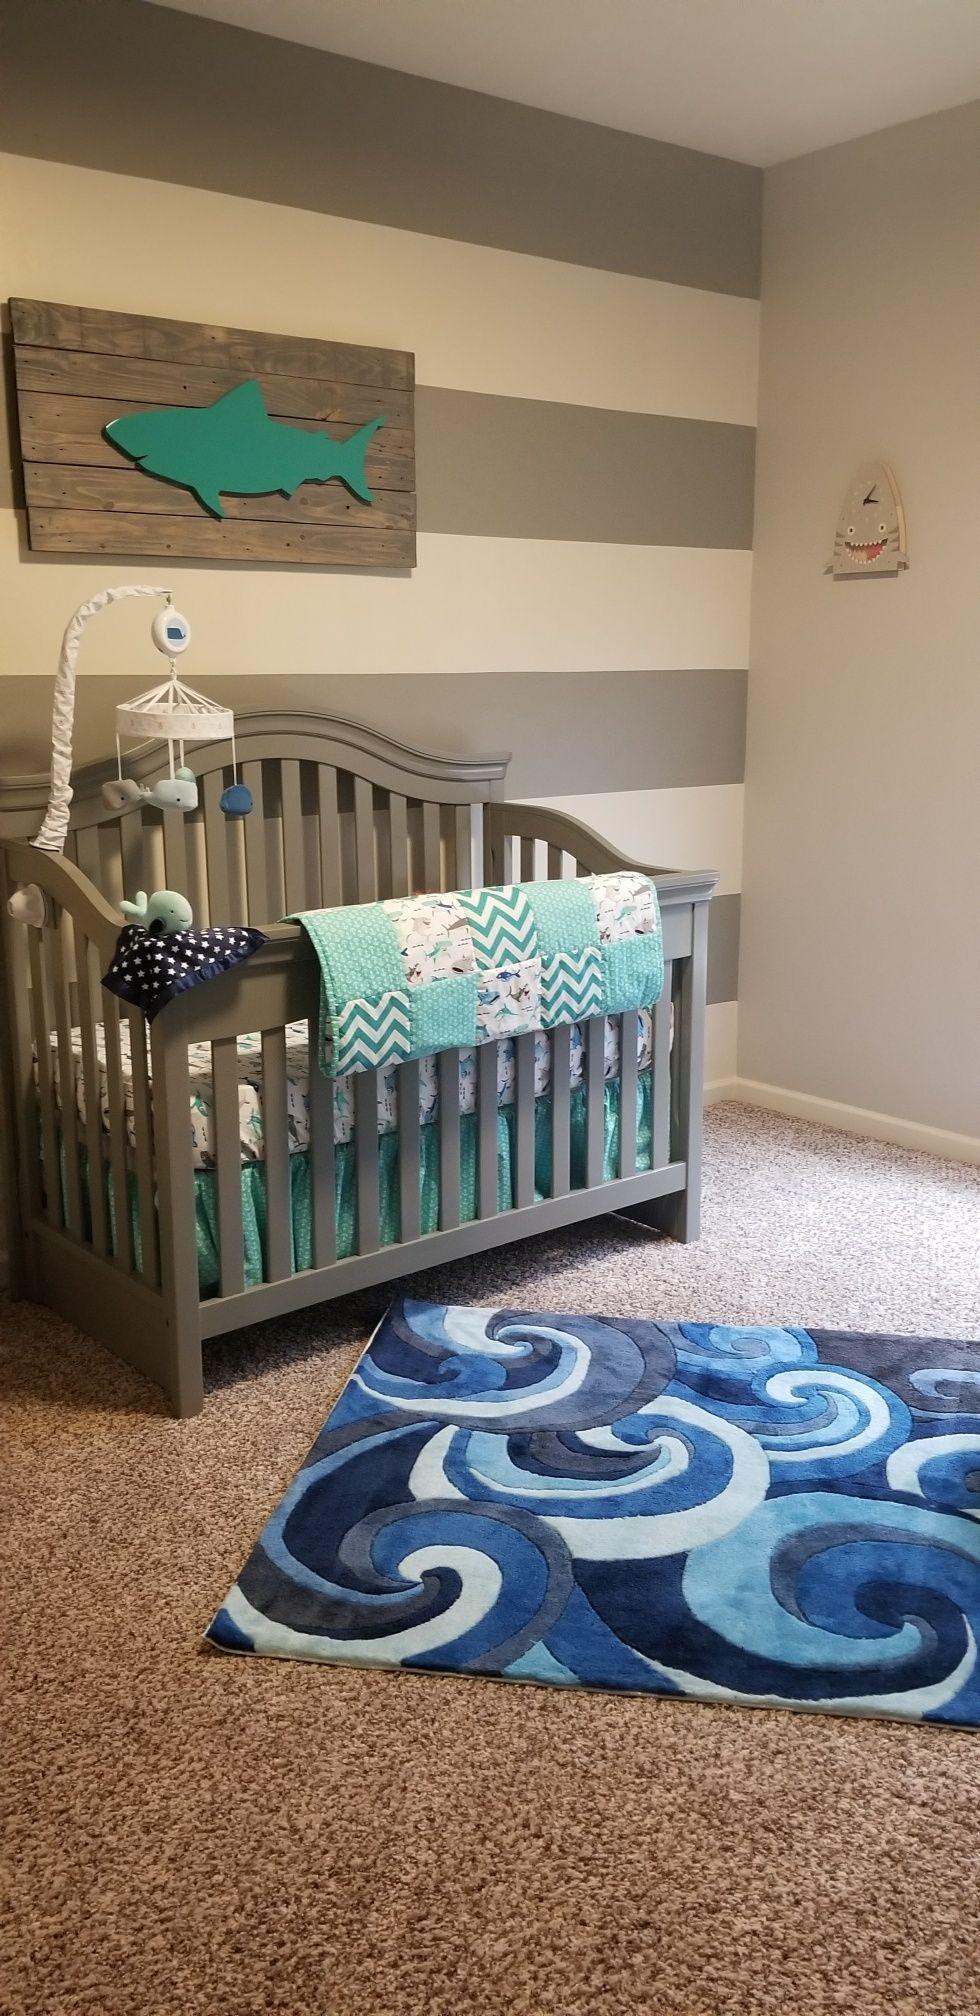 Whale Themed Nursery Whale Themed Nursery Shark Nursery Theme Whale Baby Room